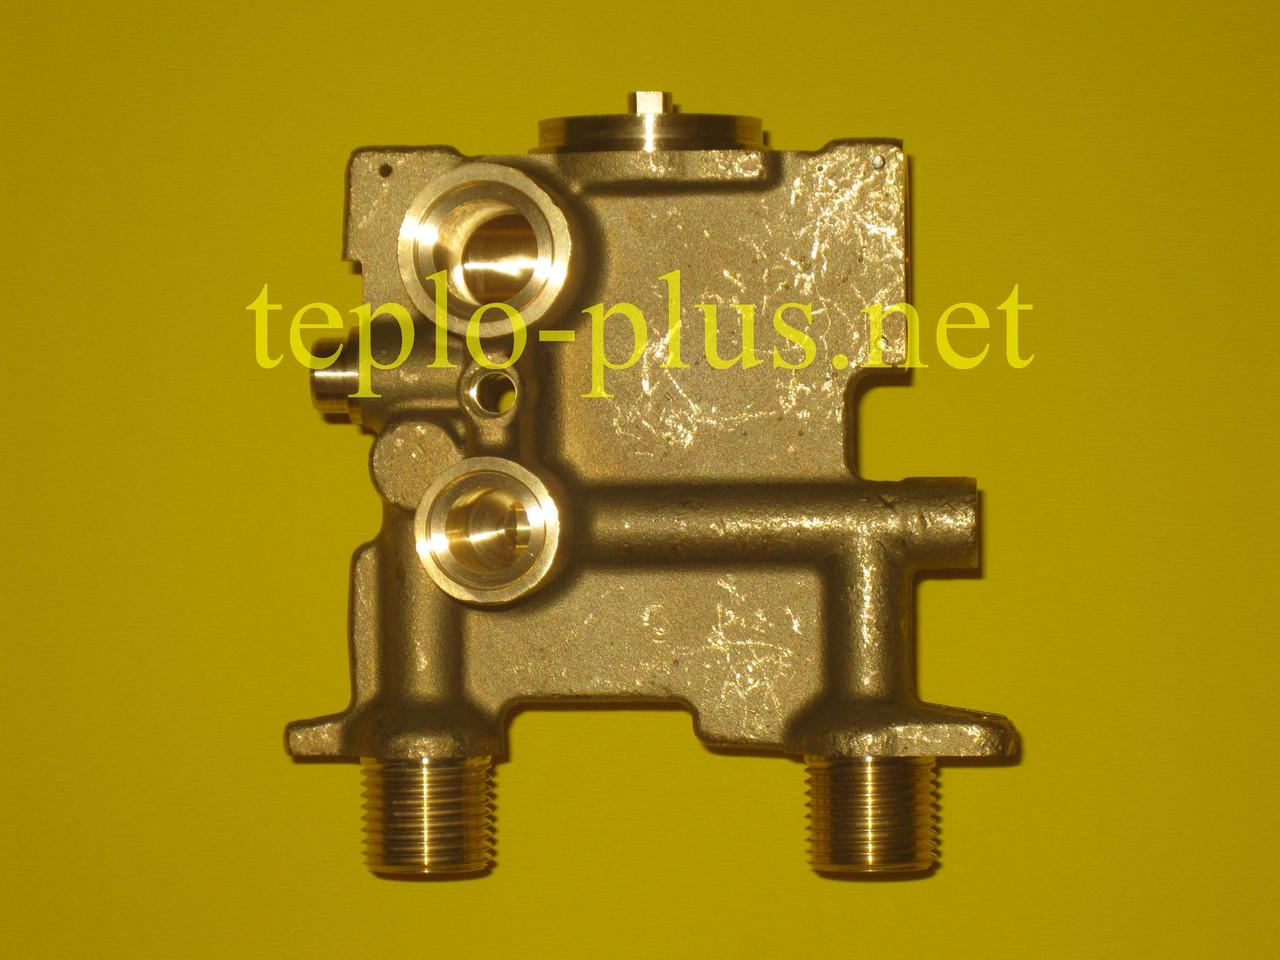 Корпус (латунный) клапана трехходового Sime Format.Zip BF TS, Format.Zip 5 25 BF TS, фото 2